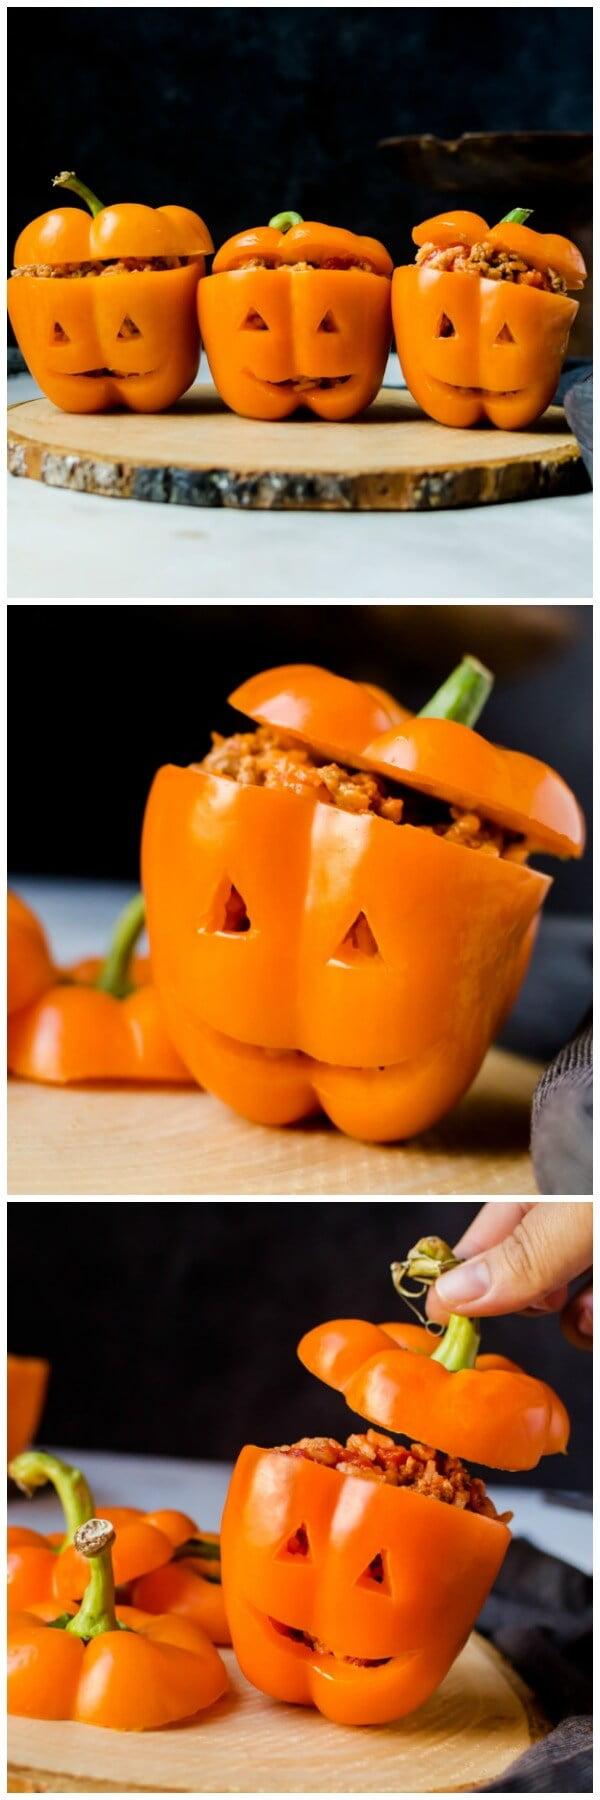 Halloween Stuffed Peppers Jack O' Lanterns